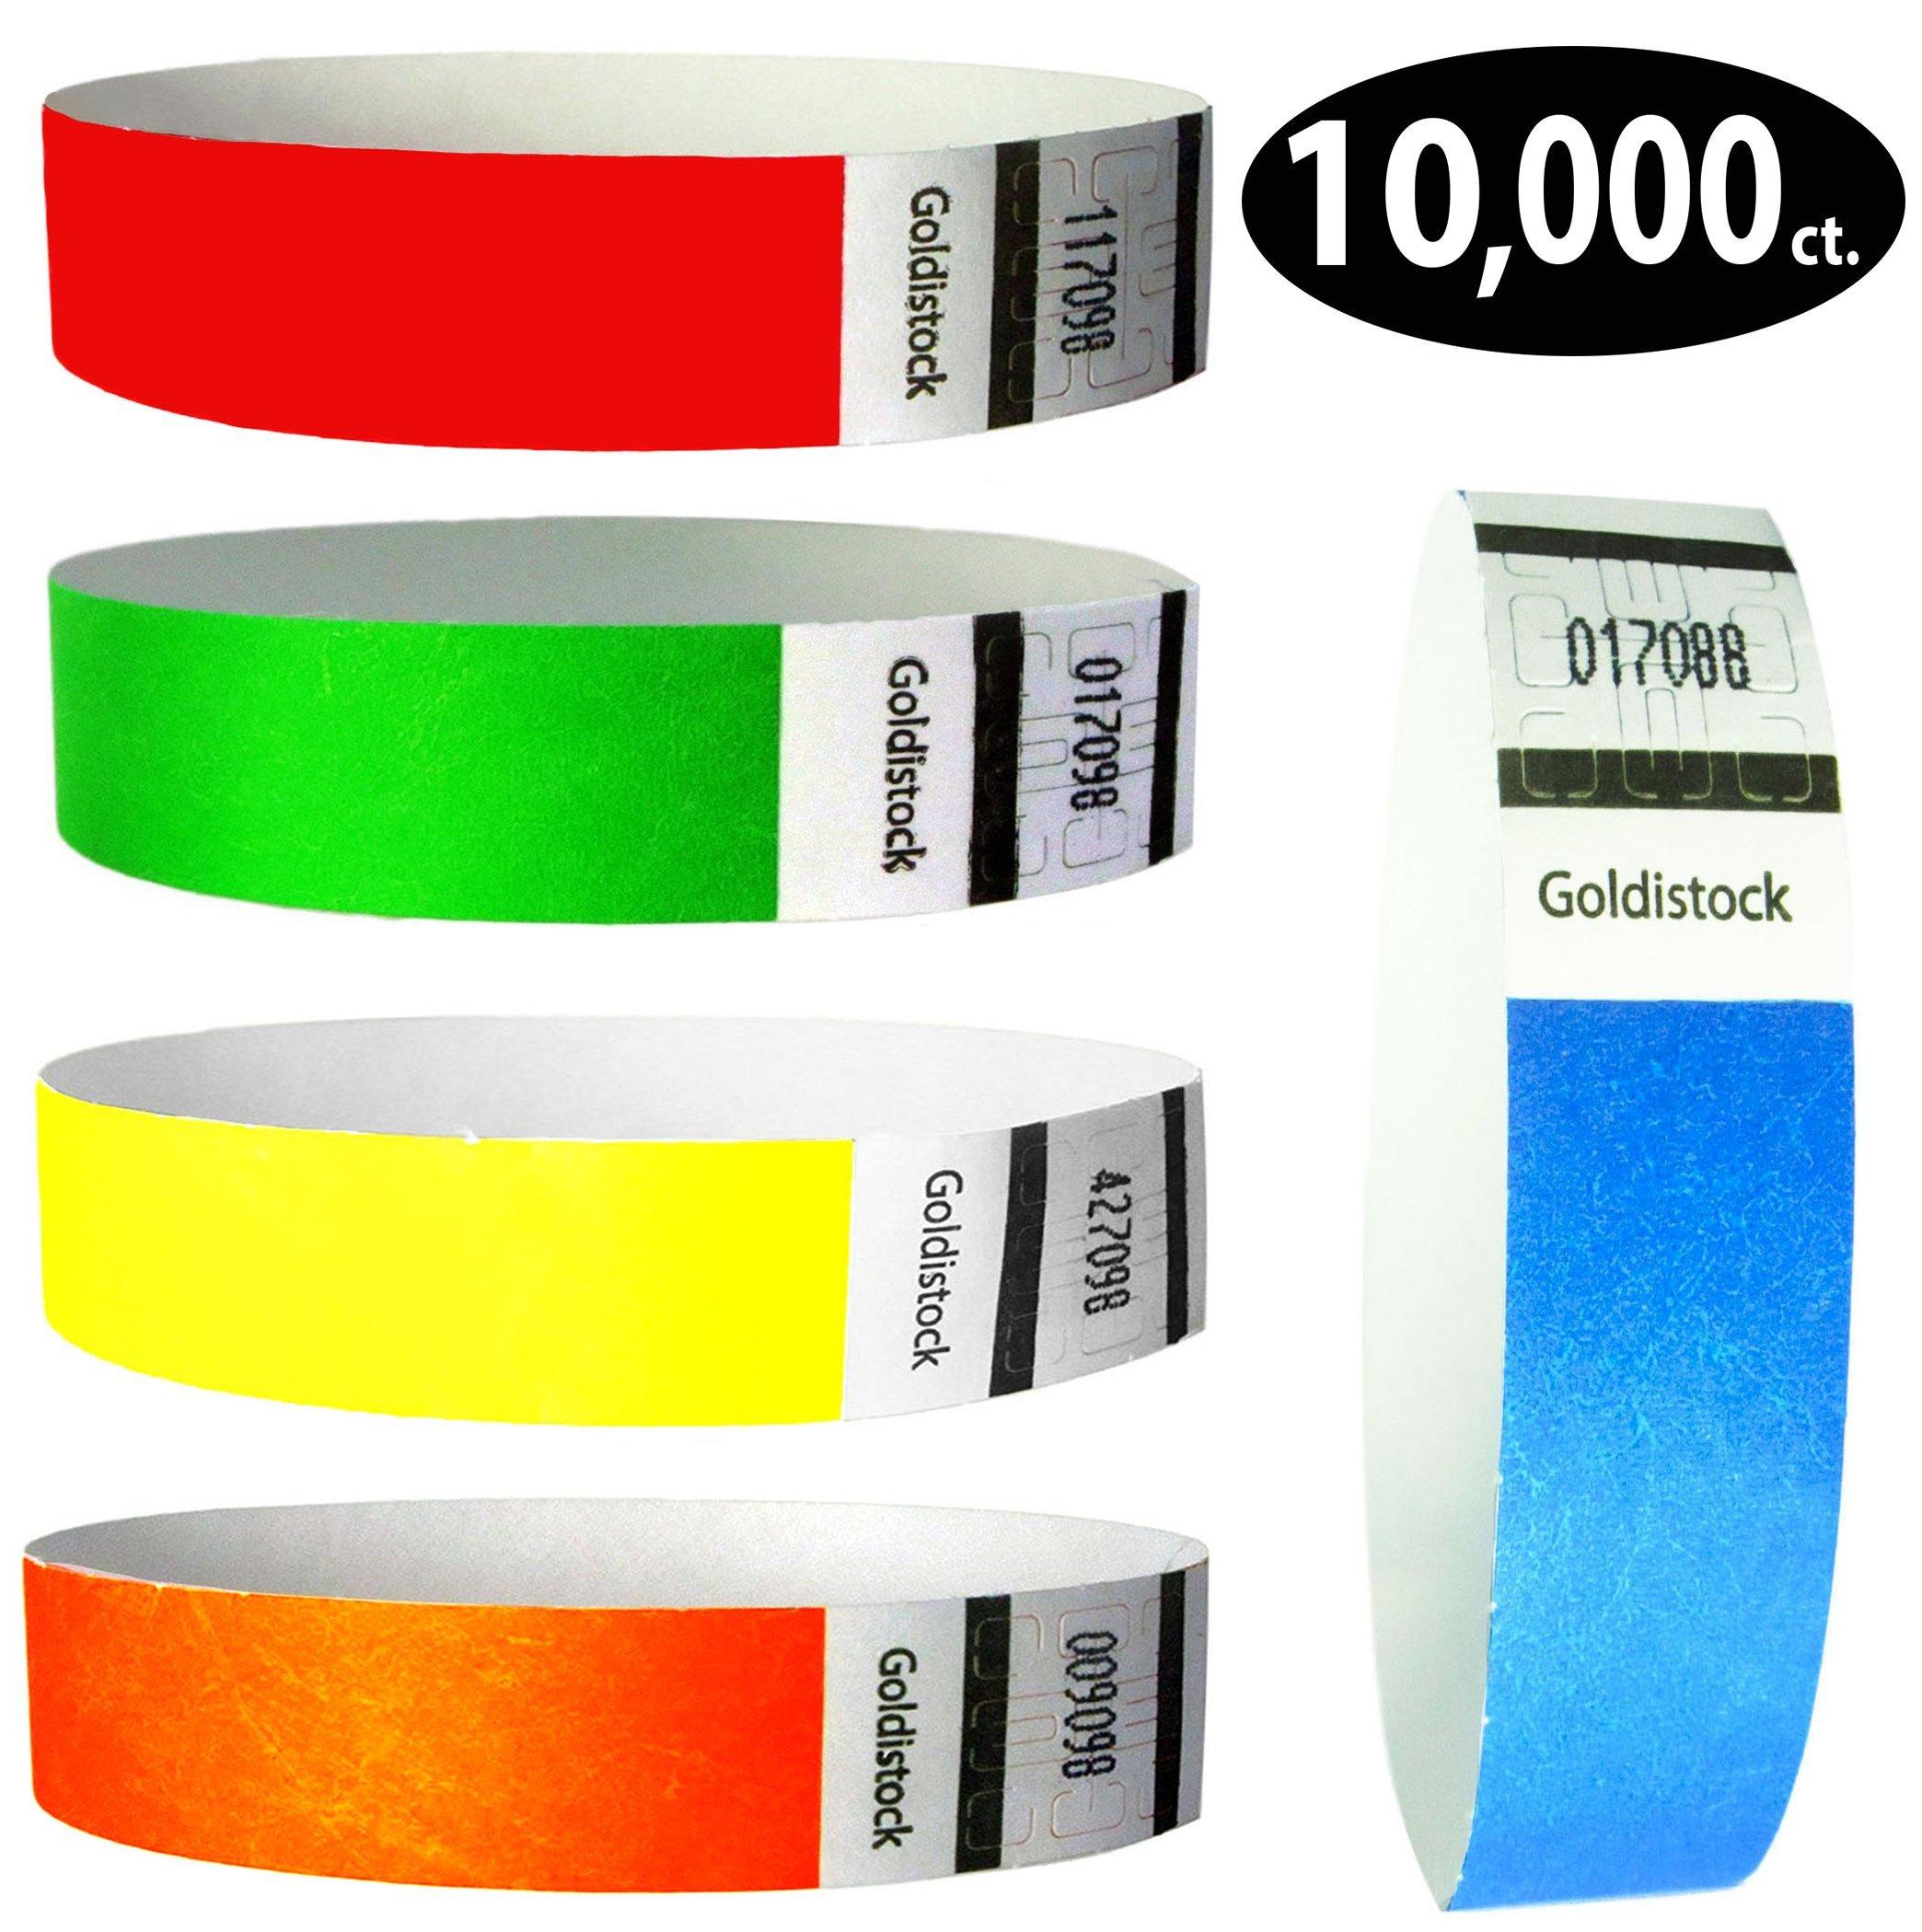 Goldistock 3/4'' Tyvek Wristbands Rainbow 10,000 Ct. Variety Pack- 2,000 Each: Neon Blue, Green, Yellow, Orange, Red